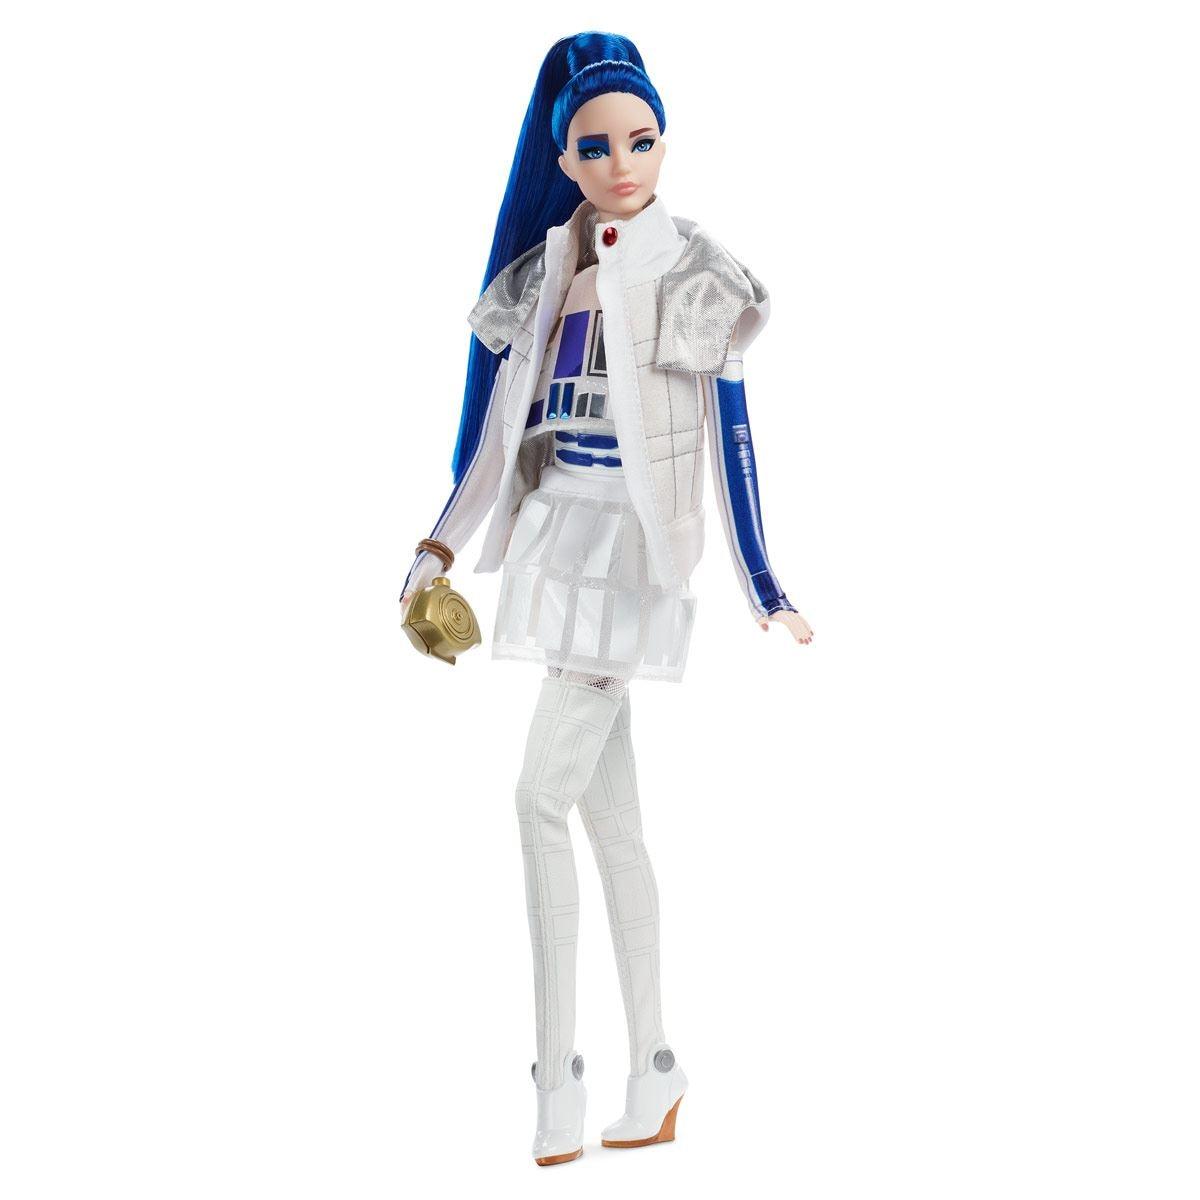 Preventa Barbie Collector Star Wars R2-D2